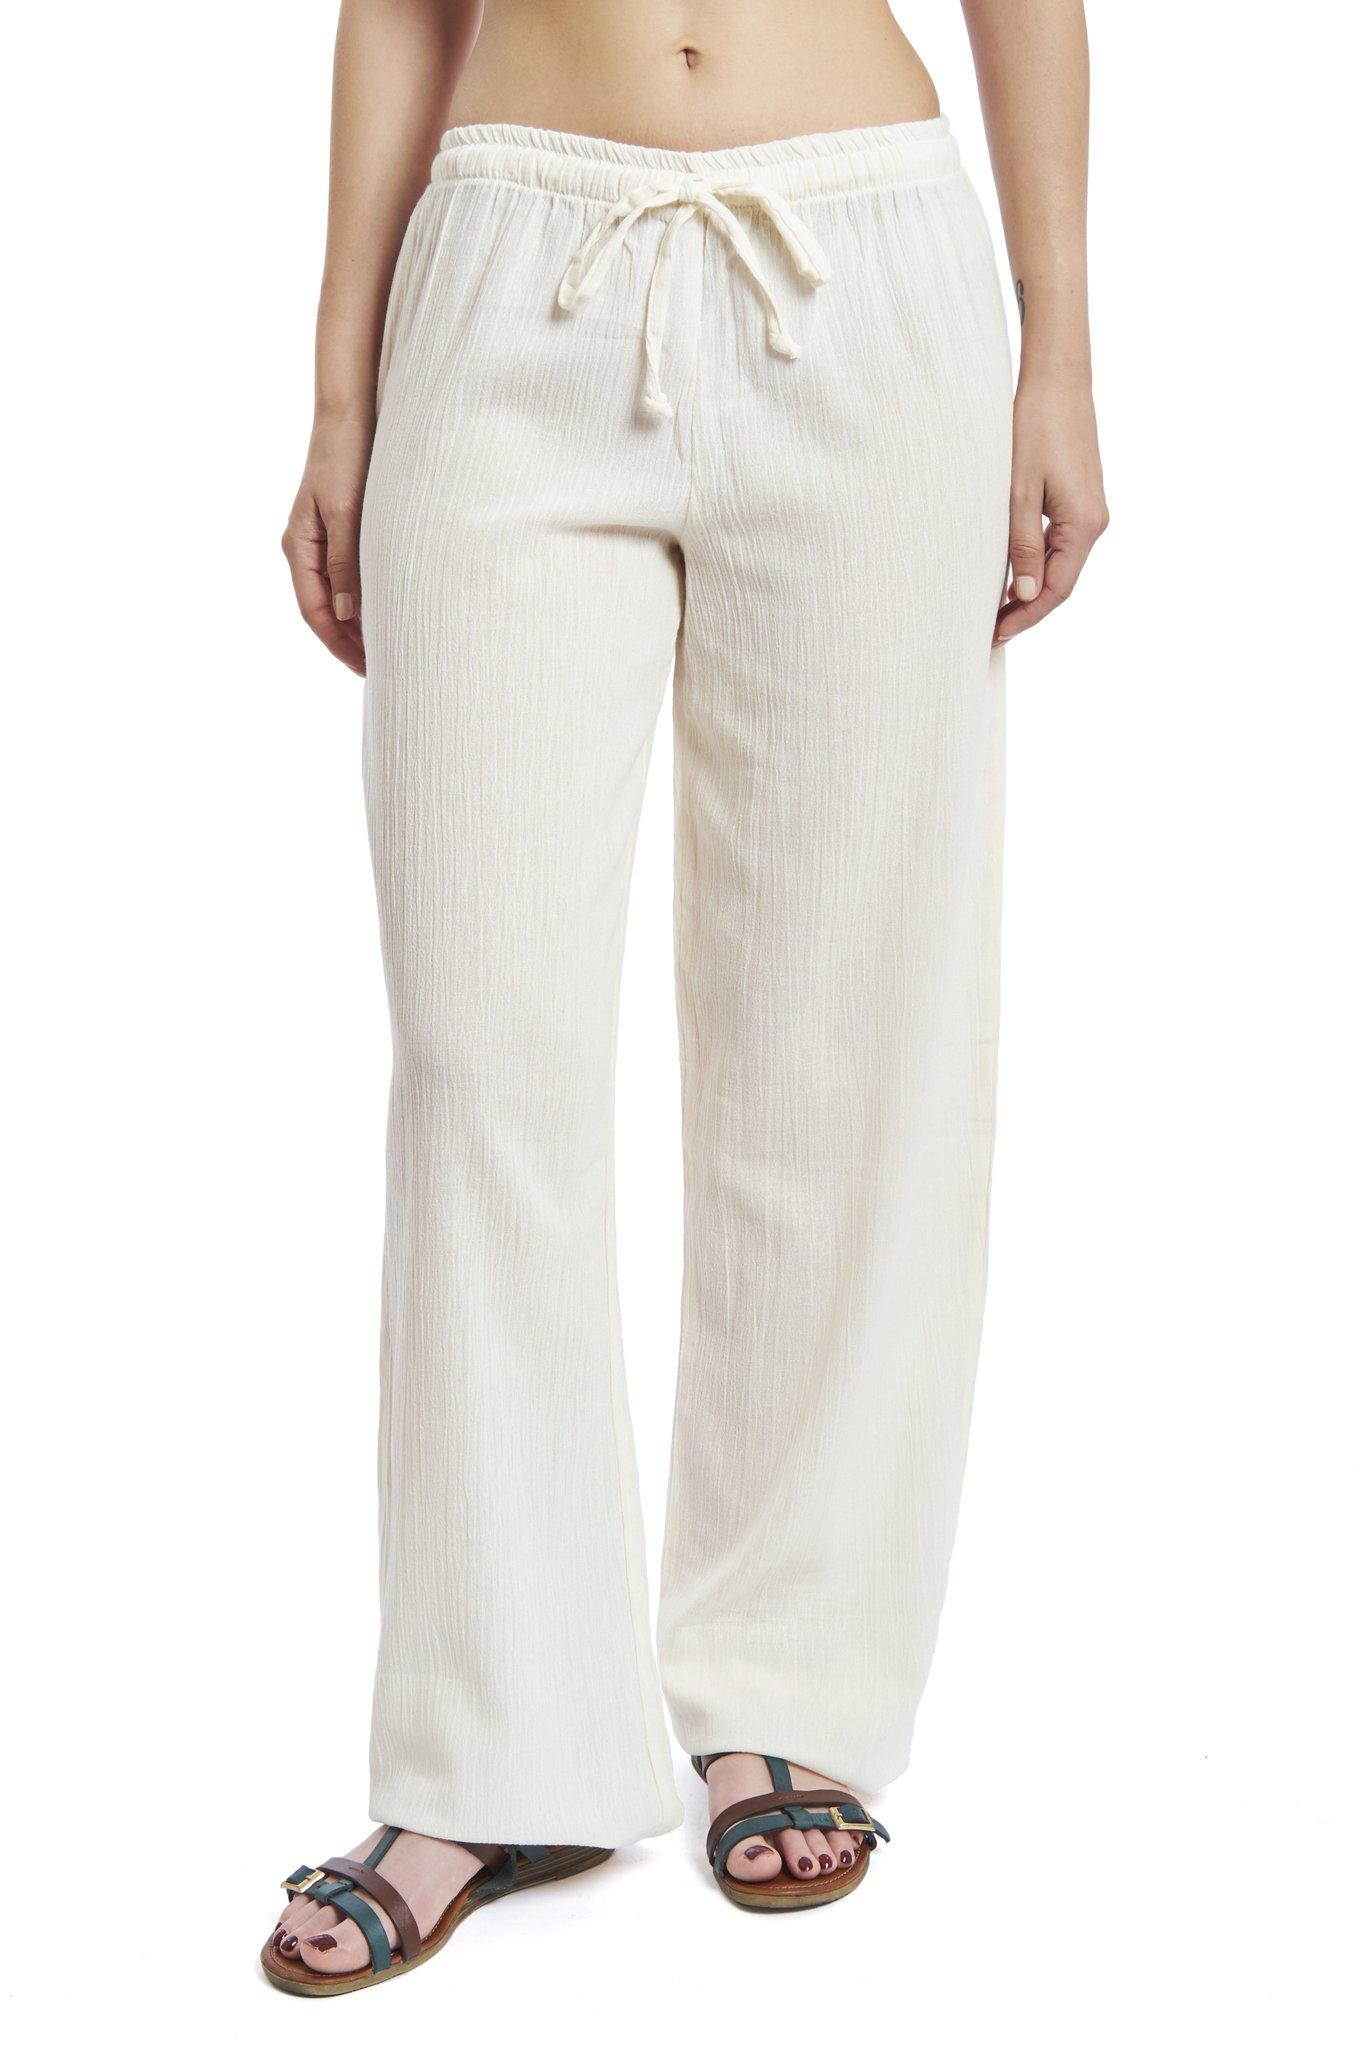 J & Ce Women's Gauze Cotton Beach and PJ Pants (Cream, Small)